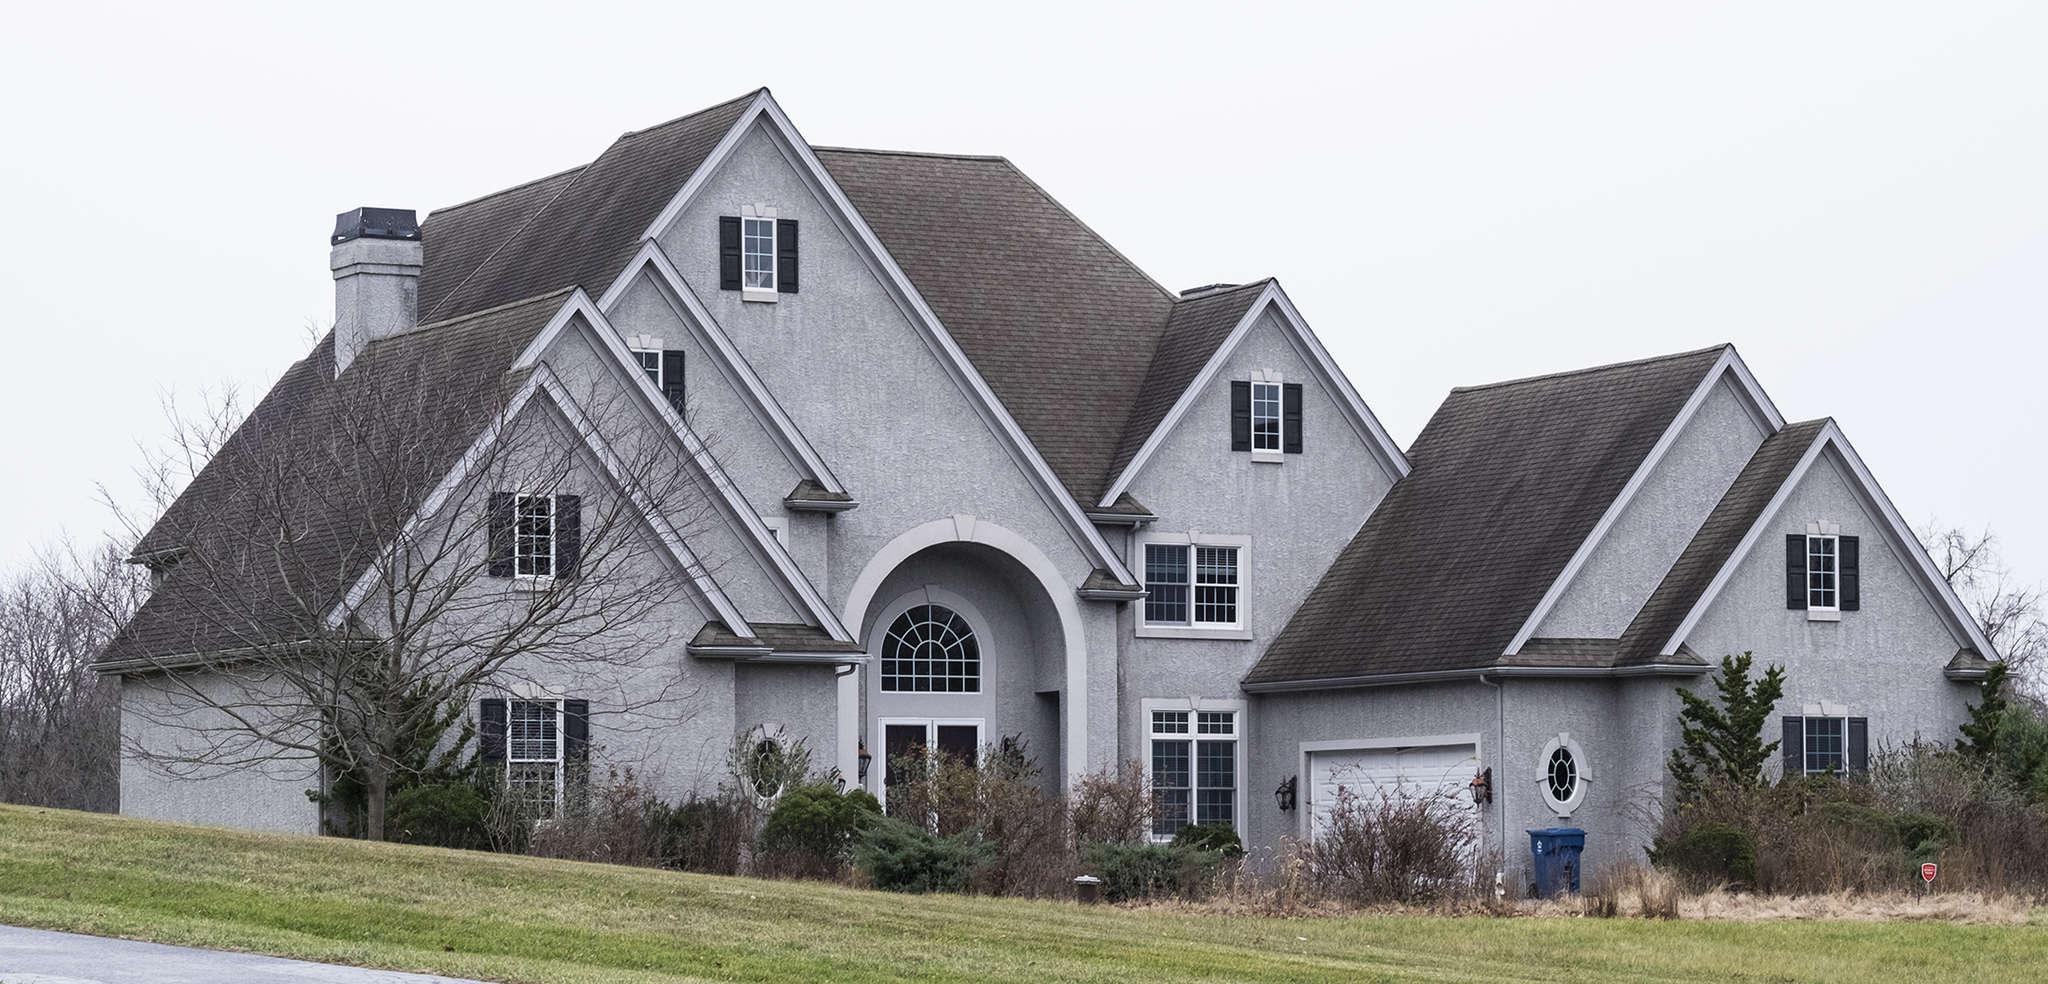 On Nivin Lane, a five-bedroom, six-bathroom house lists for $625,000.